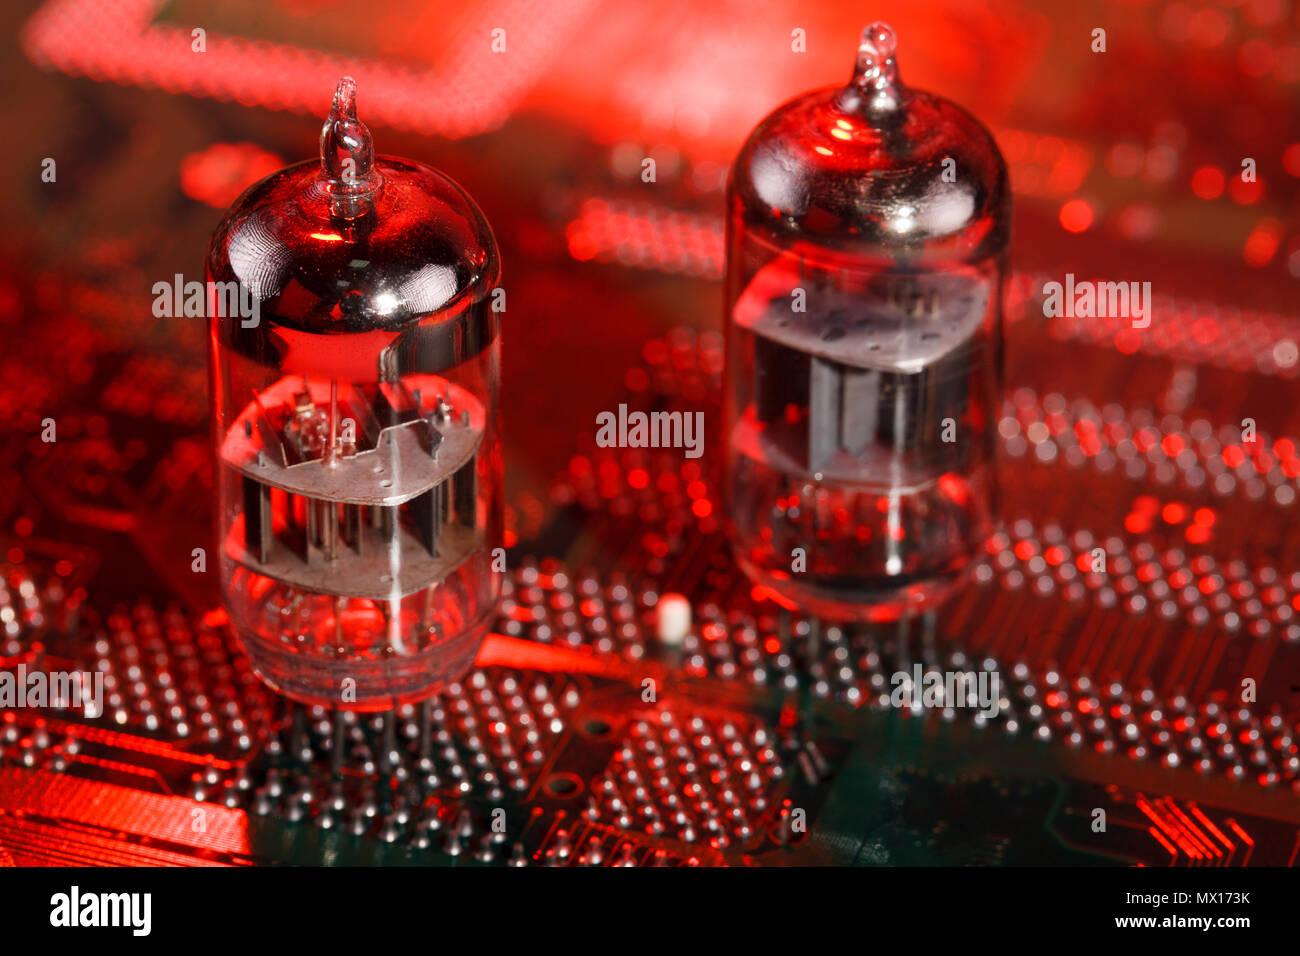 Circuit Board Television Tv Tube Stock Photos Boardtv Amplifier Buy Radio Pcb Electronic Vacuum On Image